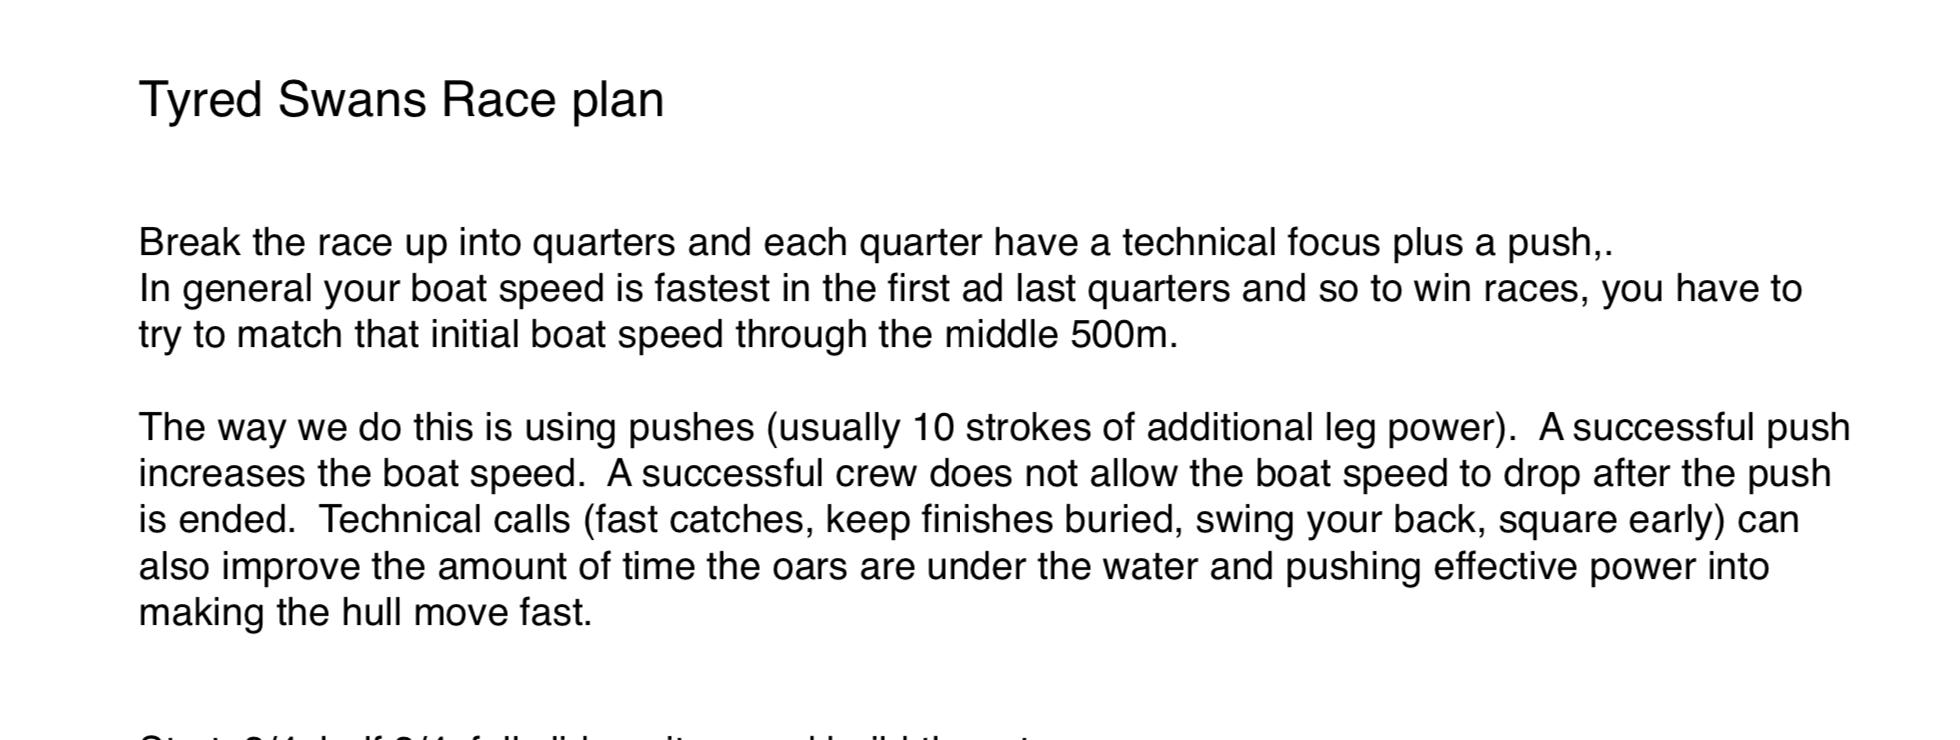 rowing race plan,